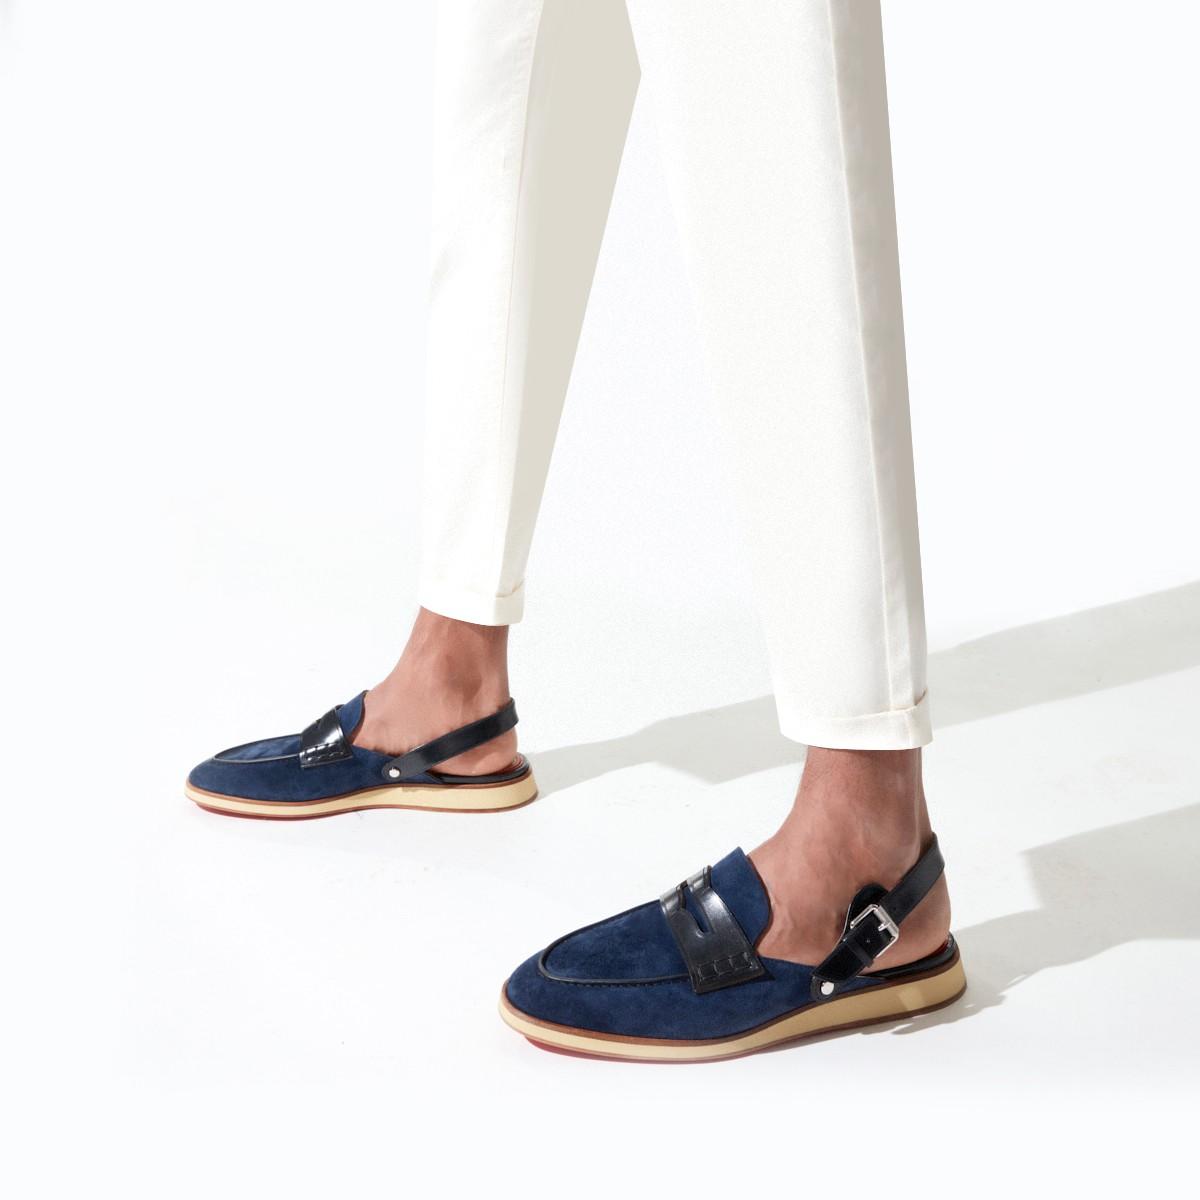 Shoes - Tricoto Flat - Christian Louboutin